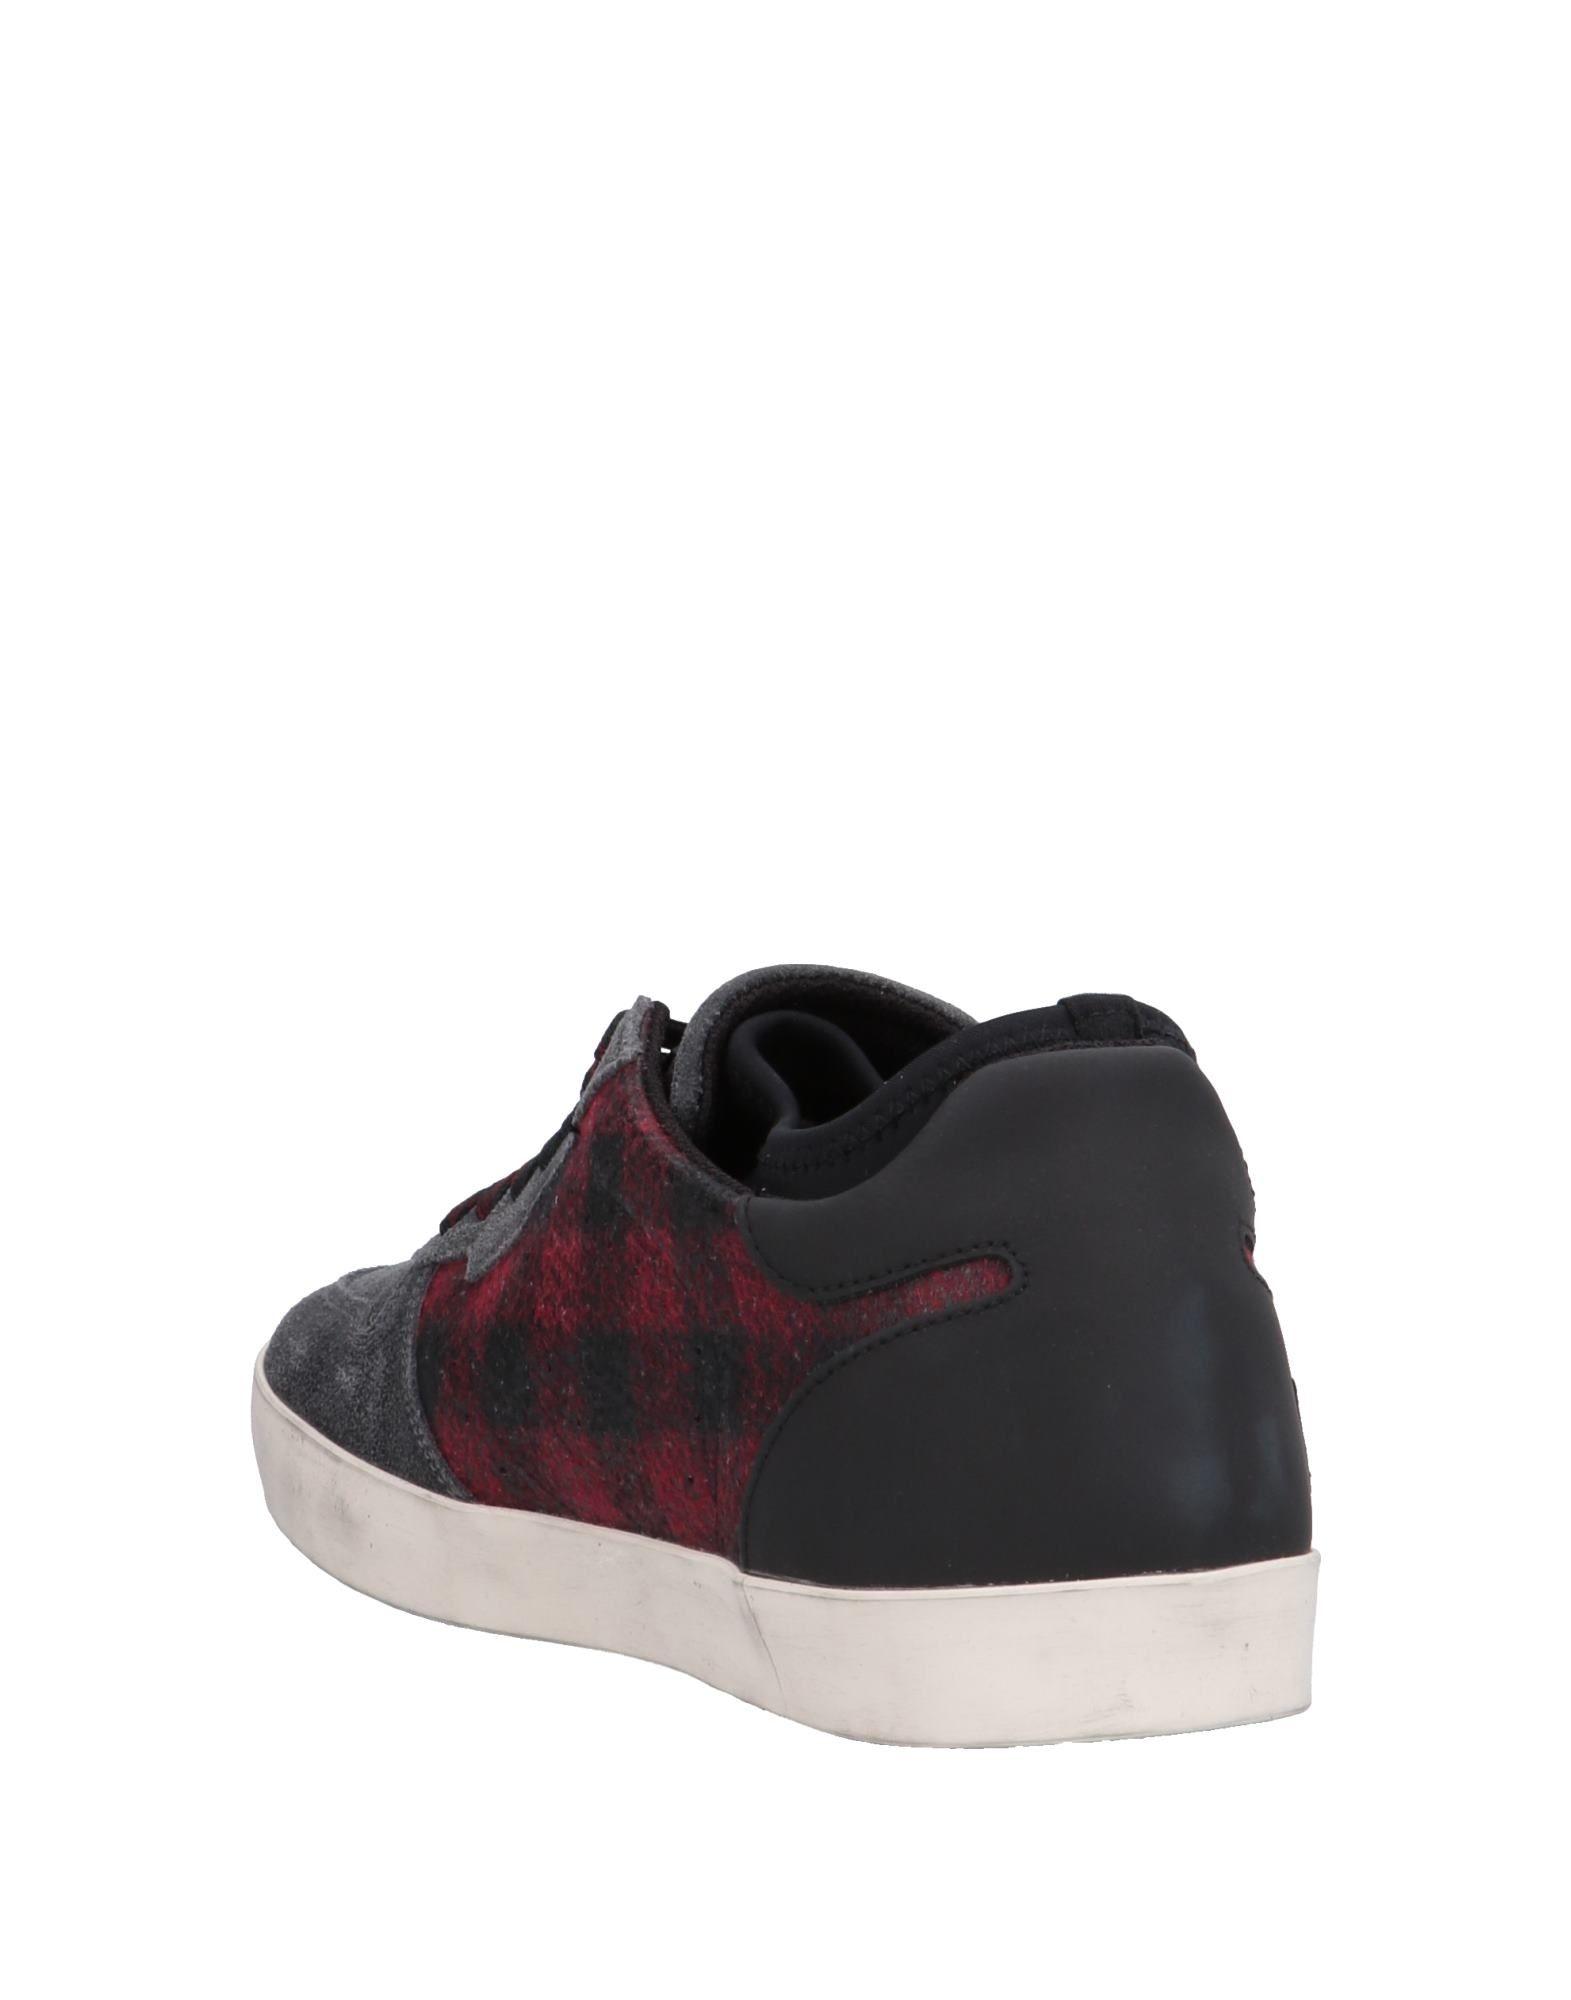 D.A.T.E. Sneakers - Men D.A.T.E. Sneakers - online on  Australia - Sneakers 11556778EU 70c774